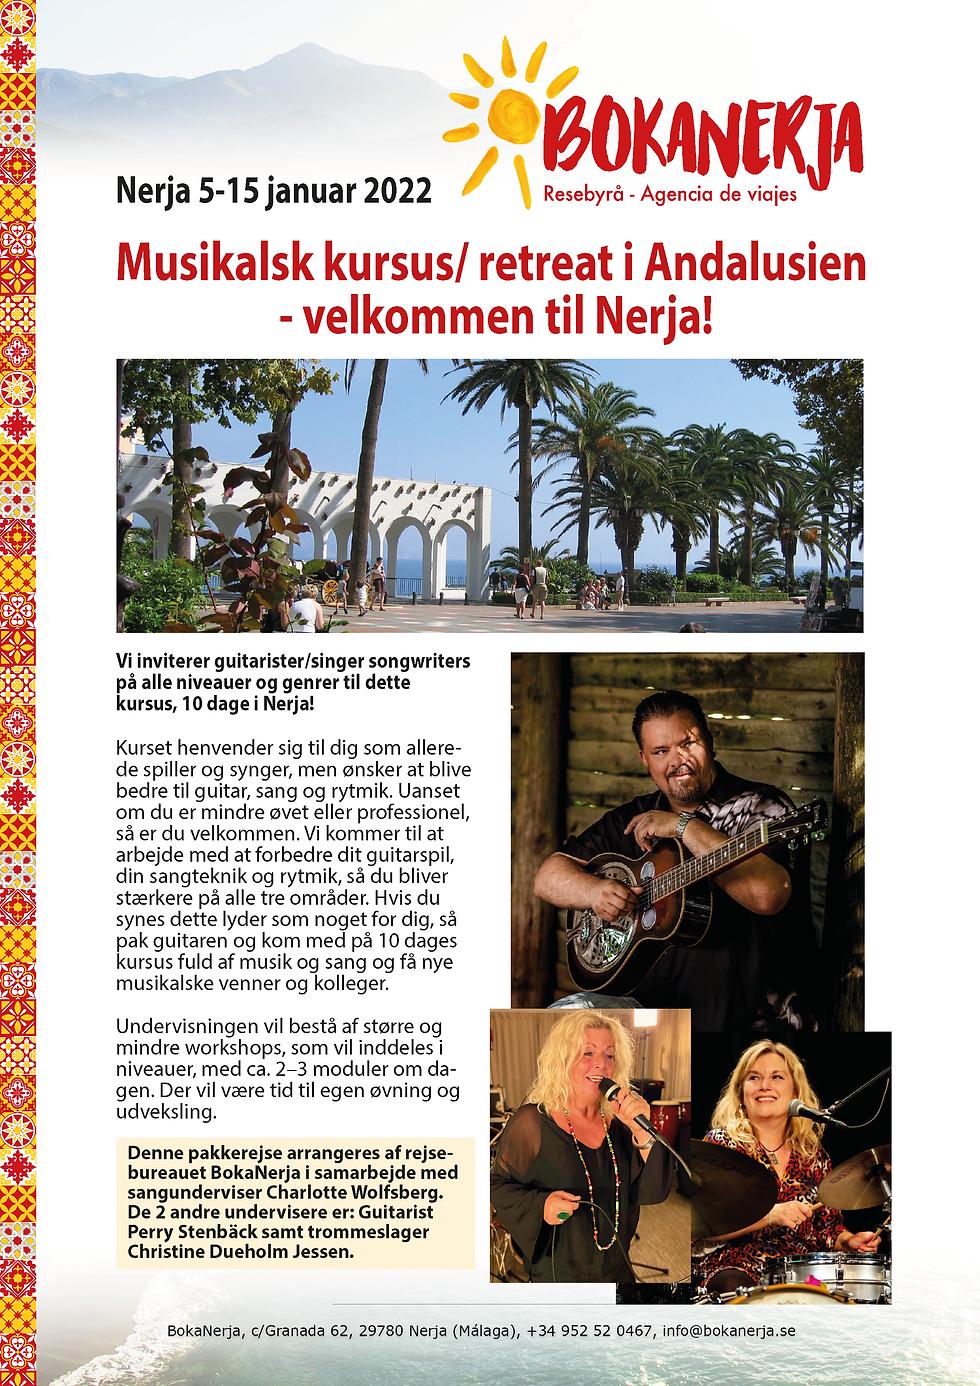 PDF FINAL Musikalisk Workshop januari 20